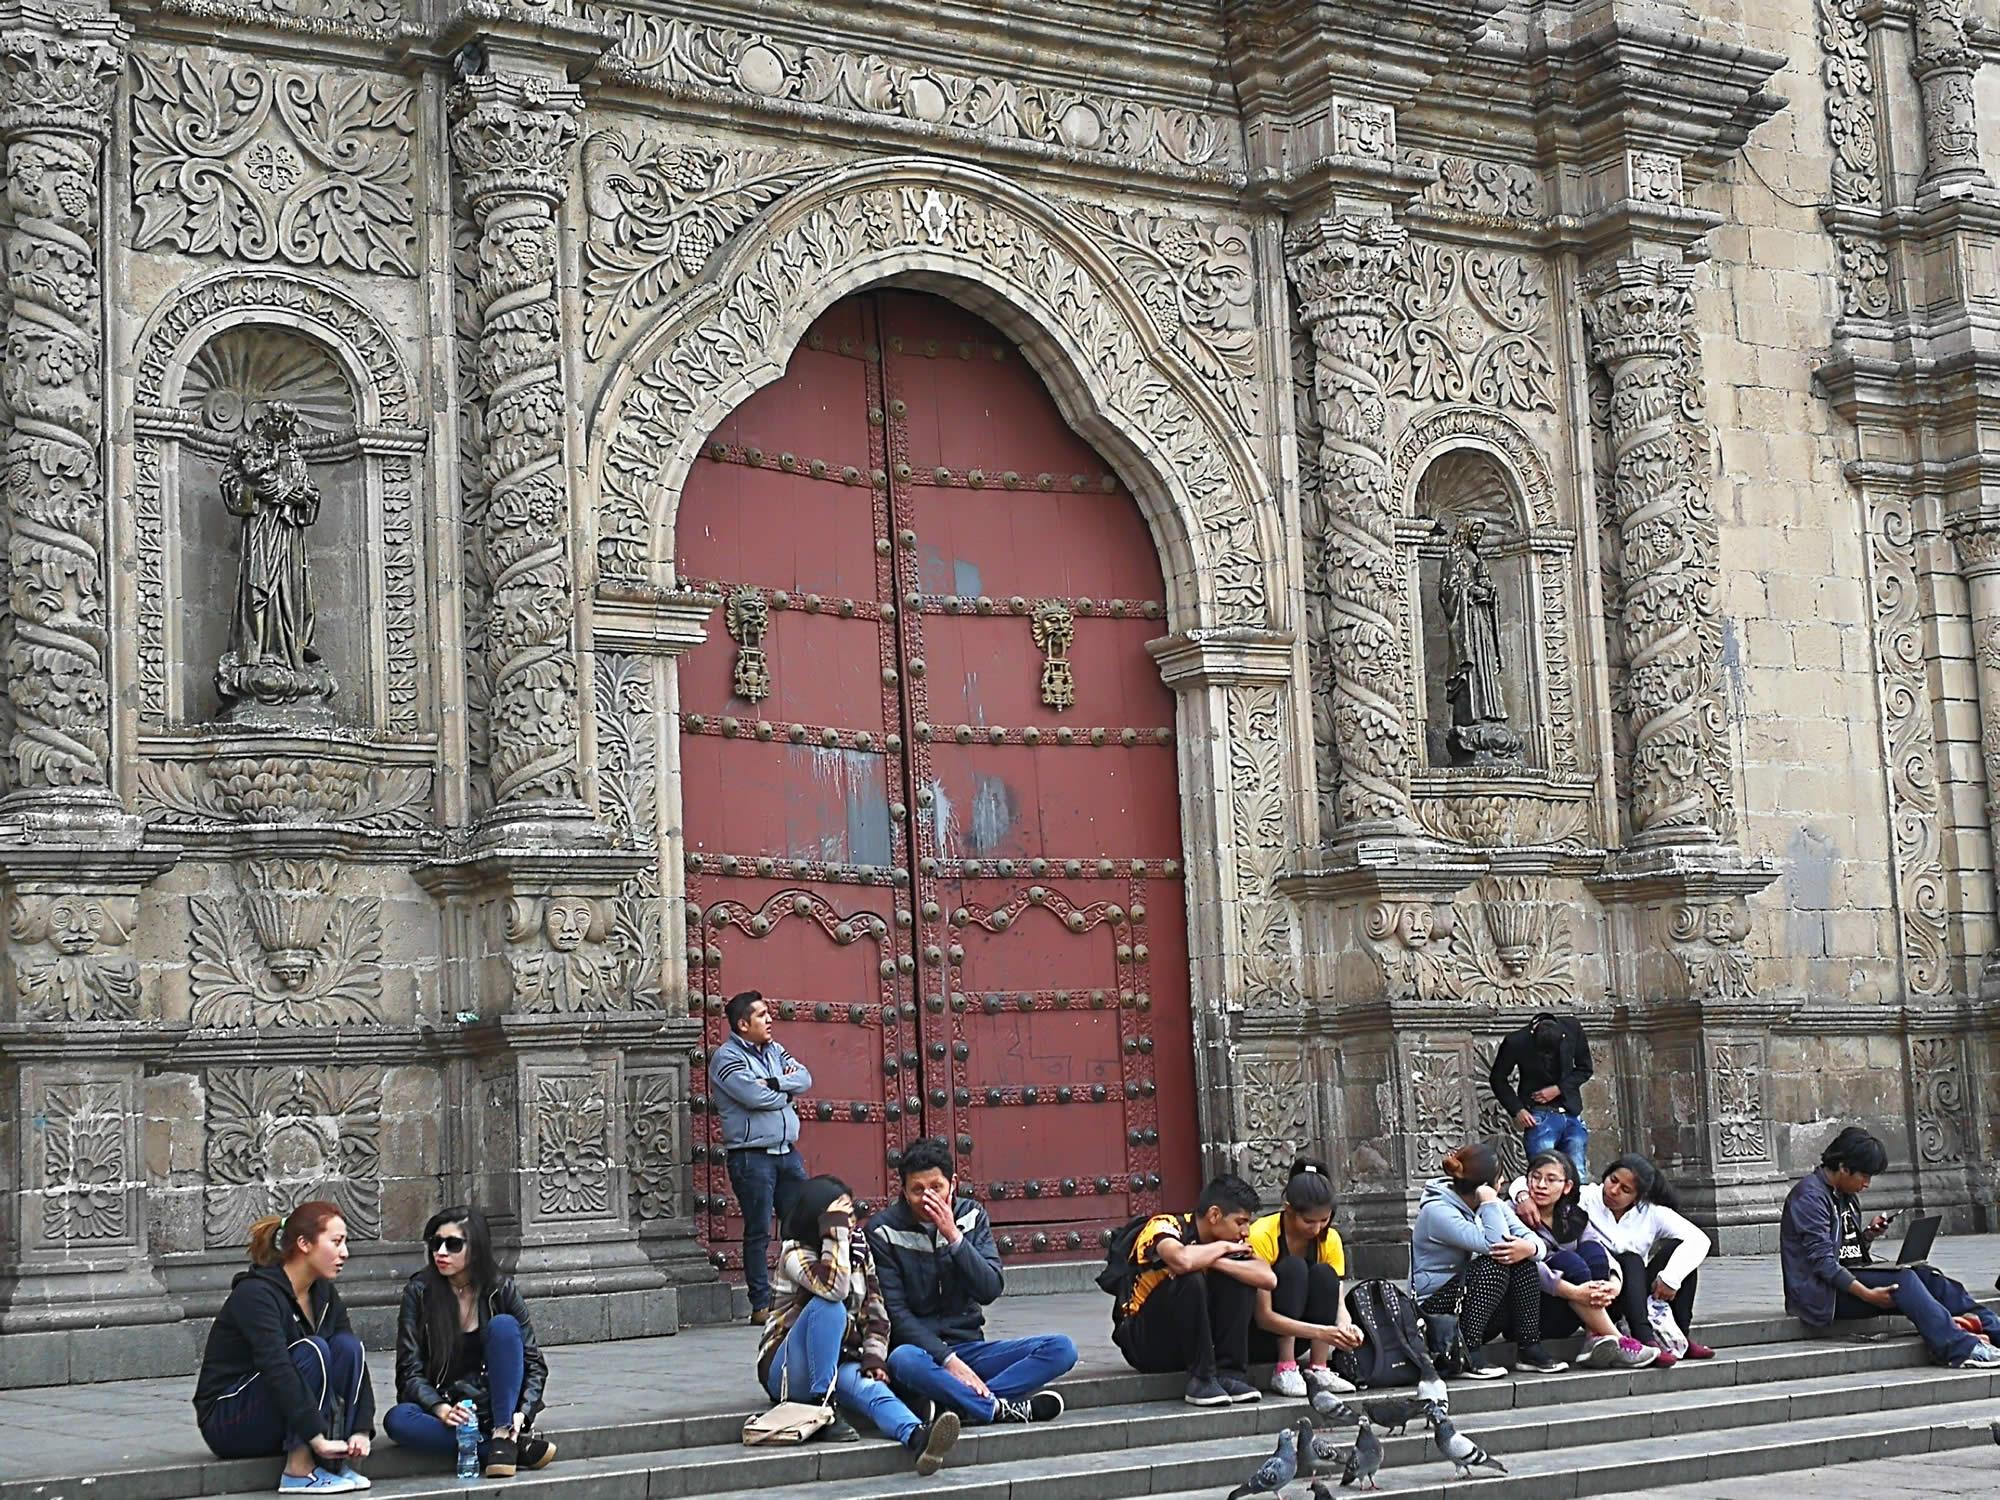 La ciudad de La Paz, La Paz